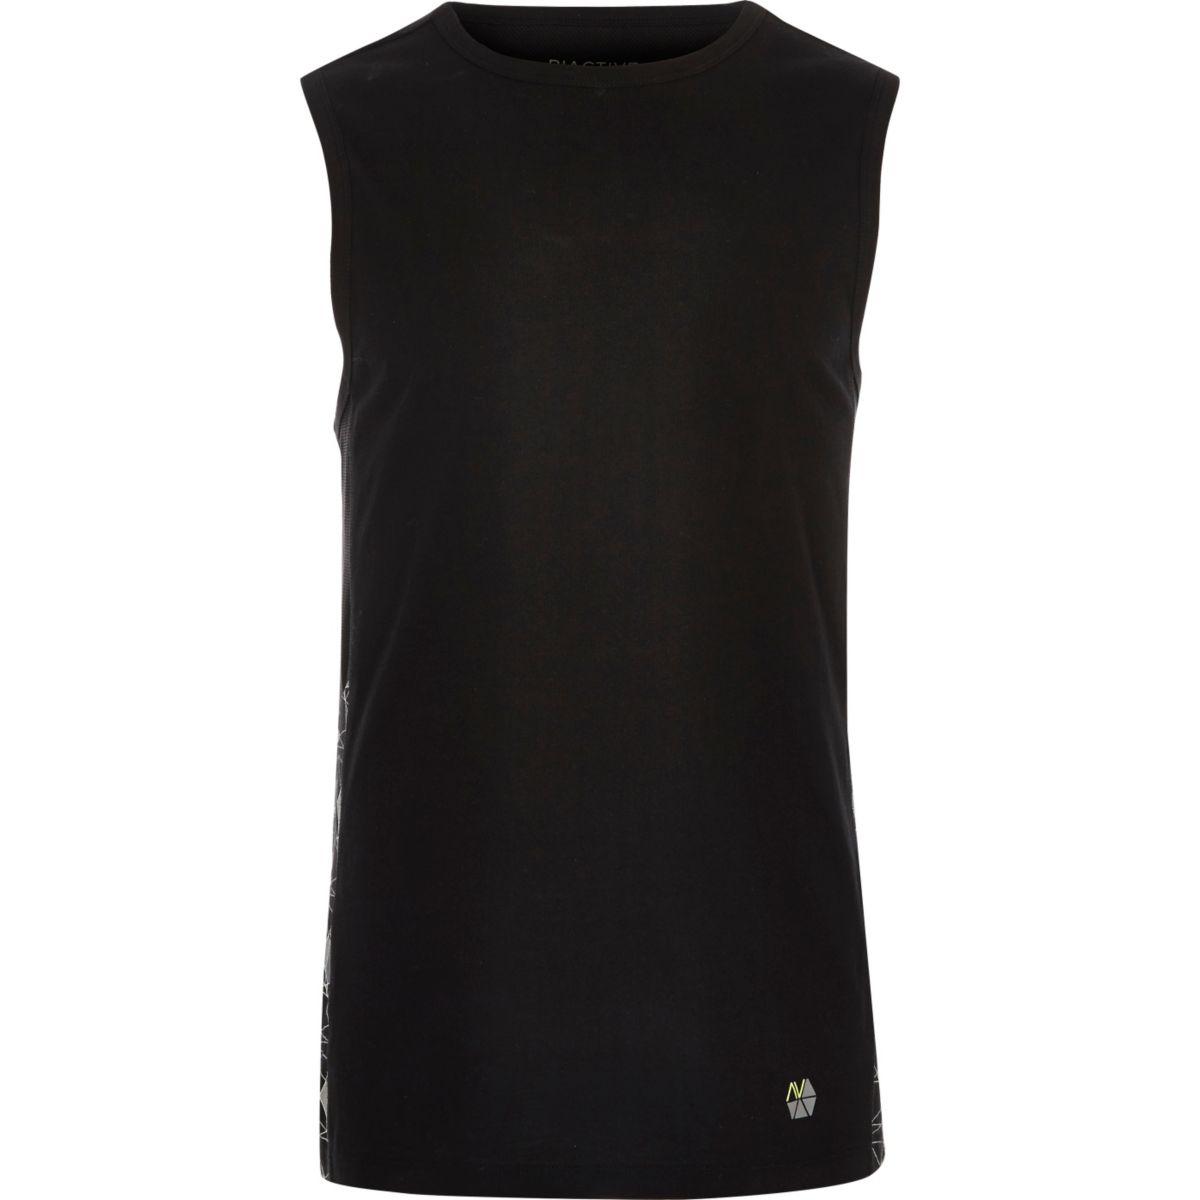 RI Active black mesh print gym tank top